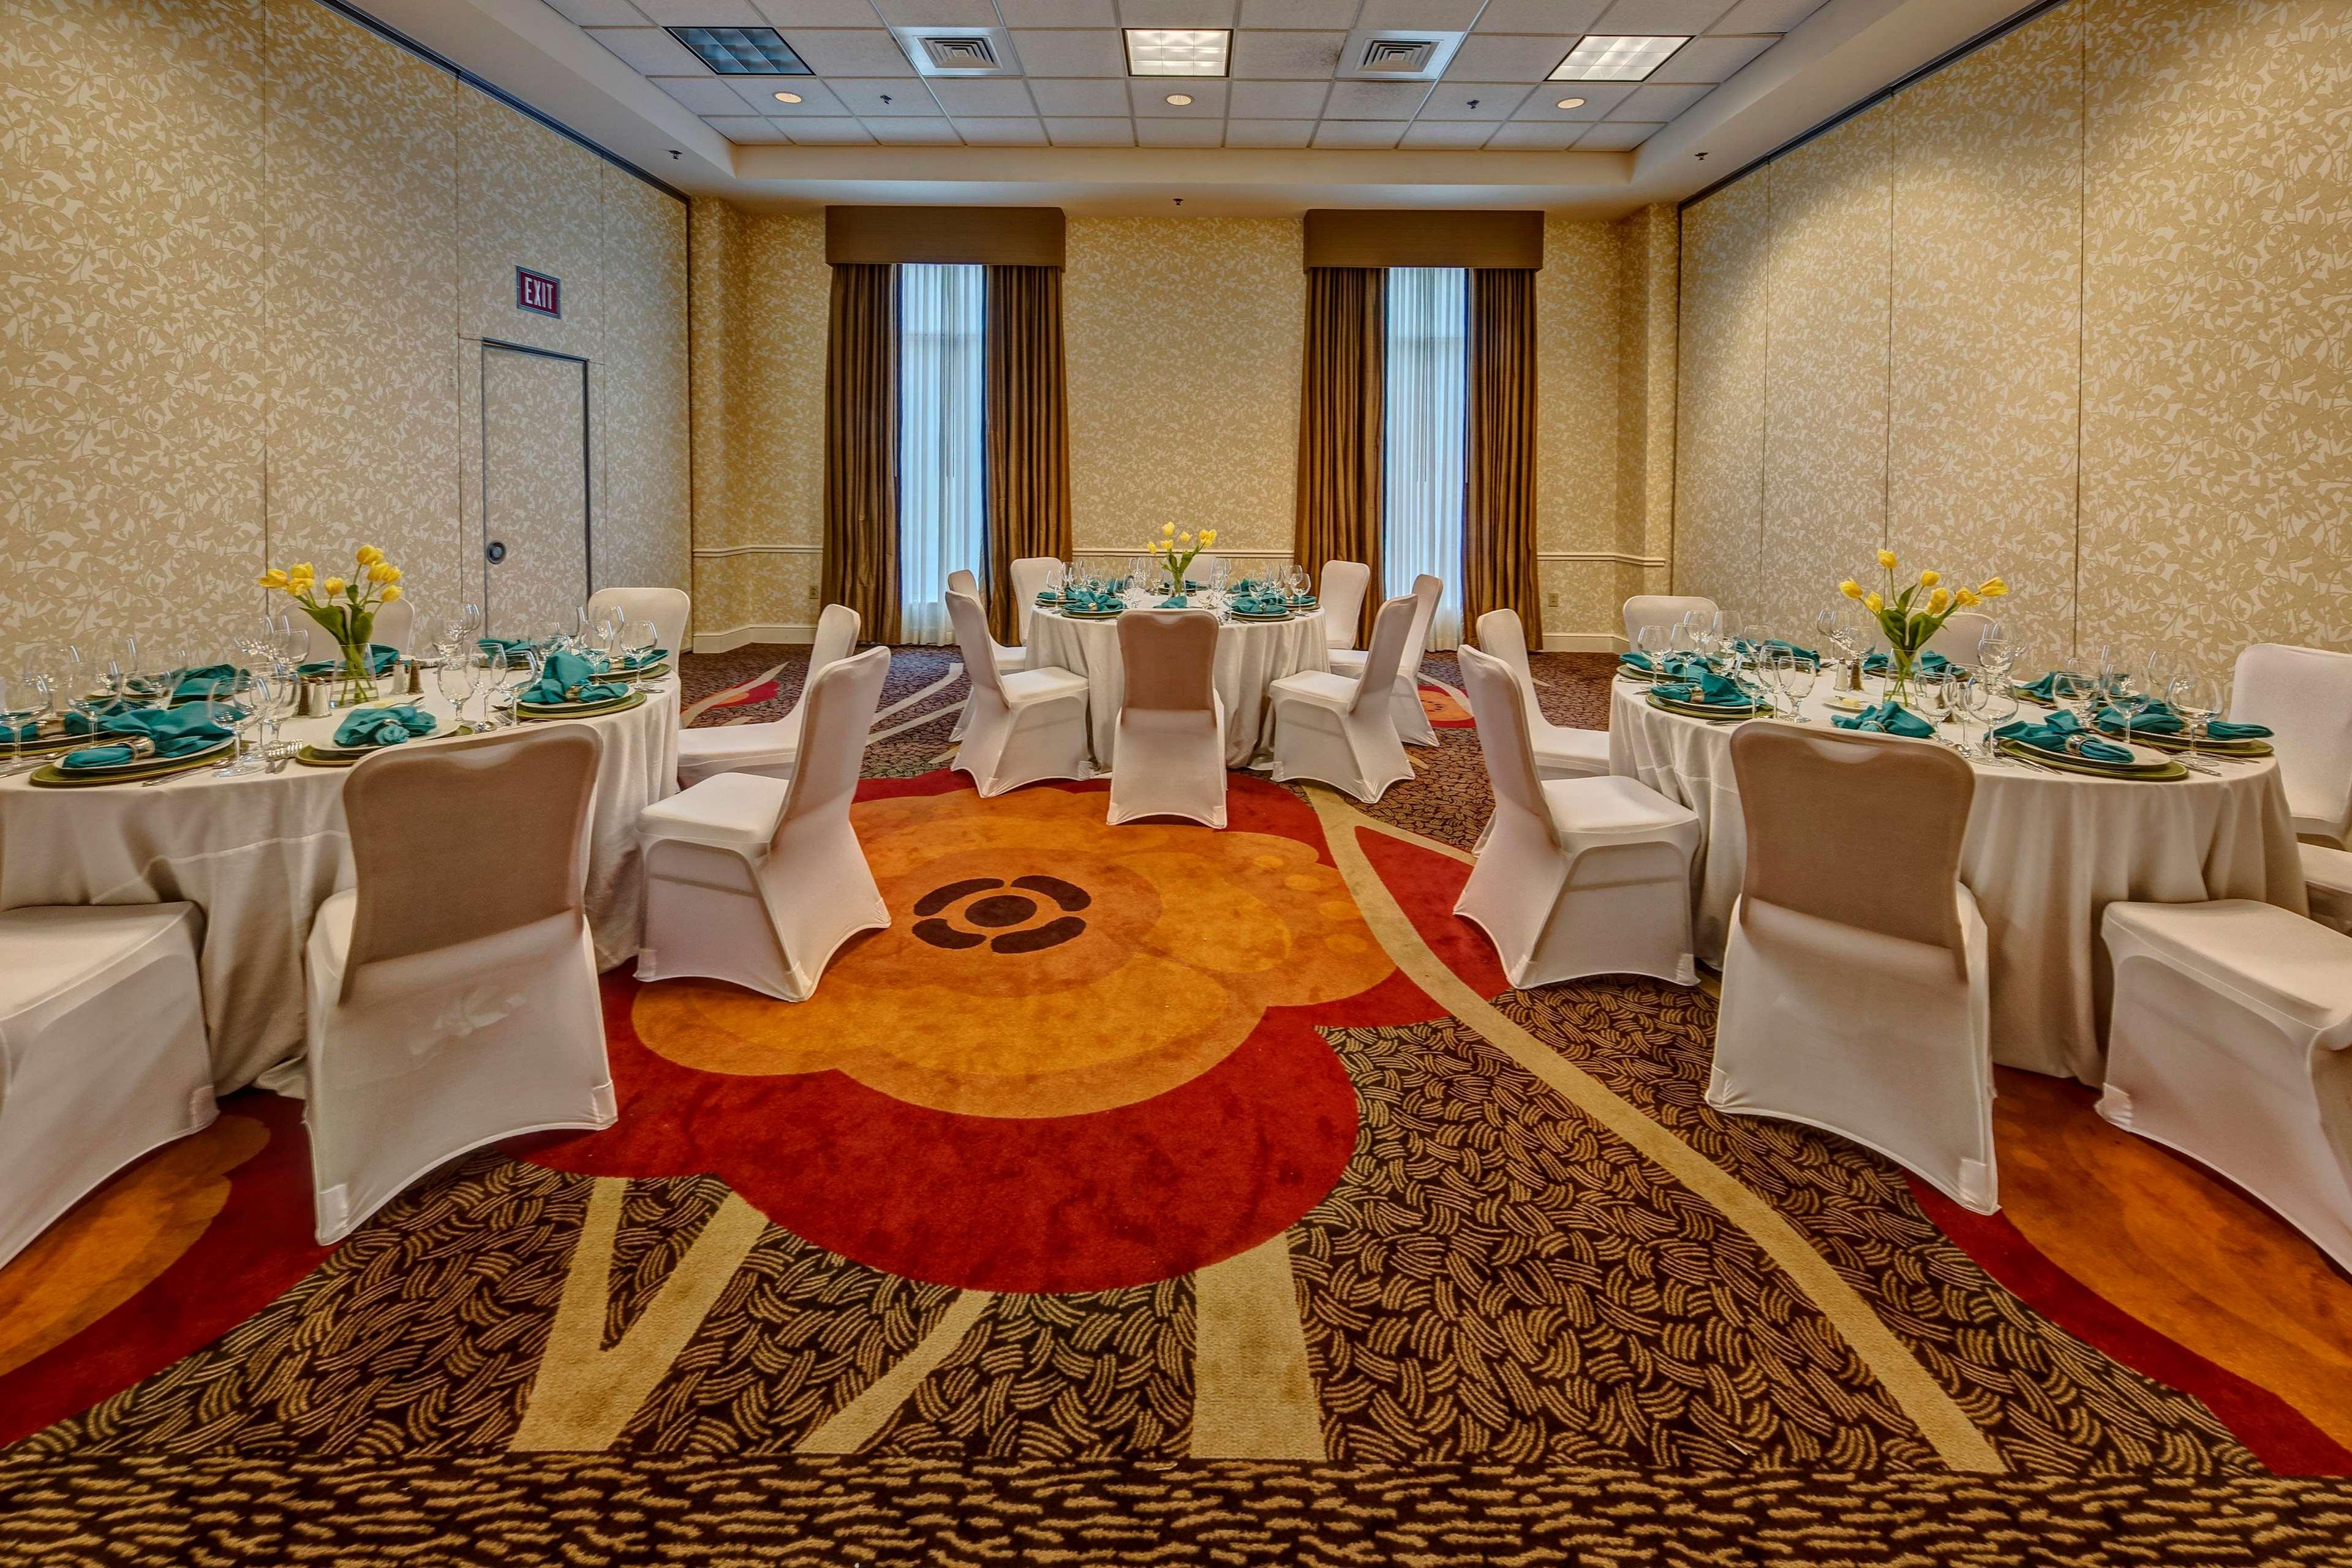 Hilton Garden Inn New Orleans Convention Center New Orleans Louisiana La